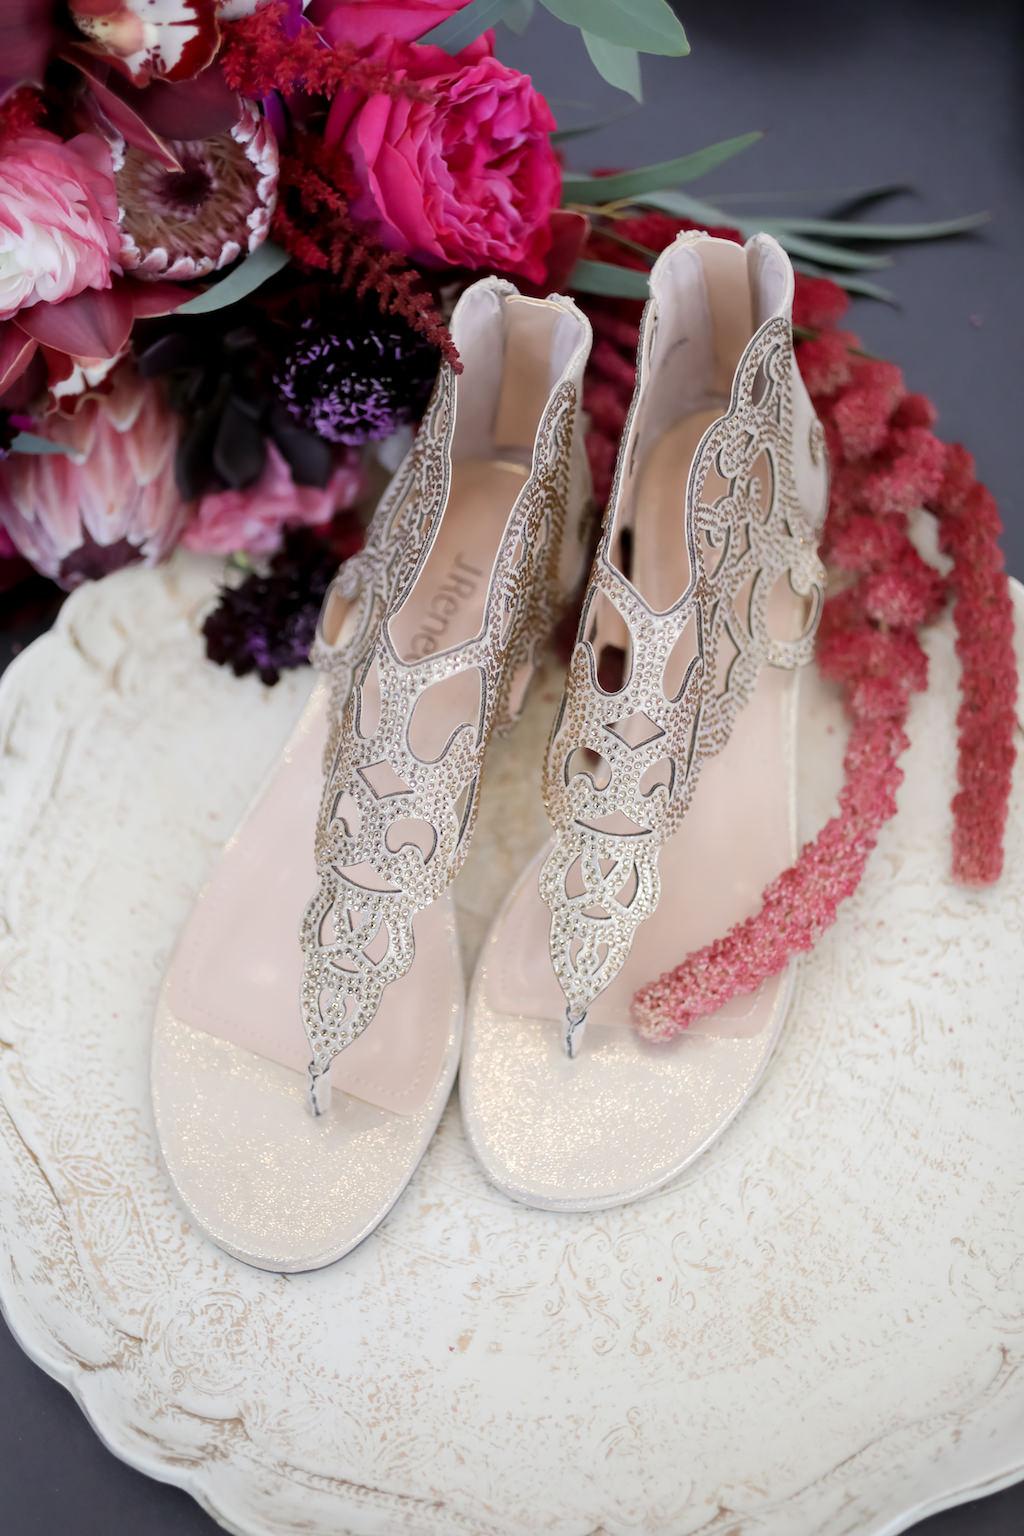 Silver and Rhinestone Cage Style Flat Sandal | Tampa Bay Wedding Photographer Lifelong Photography Studios